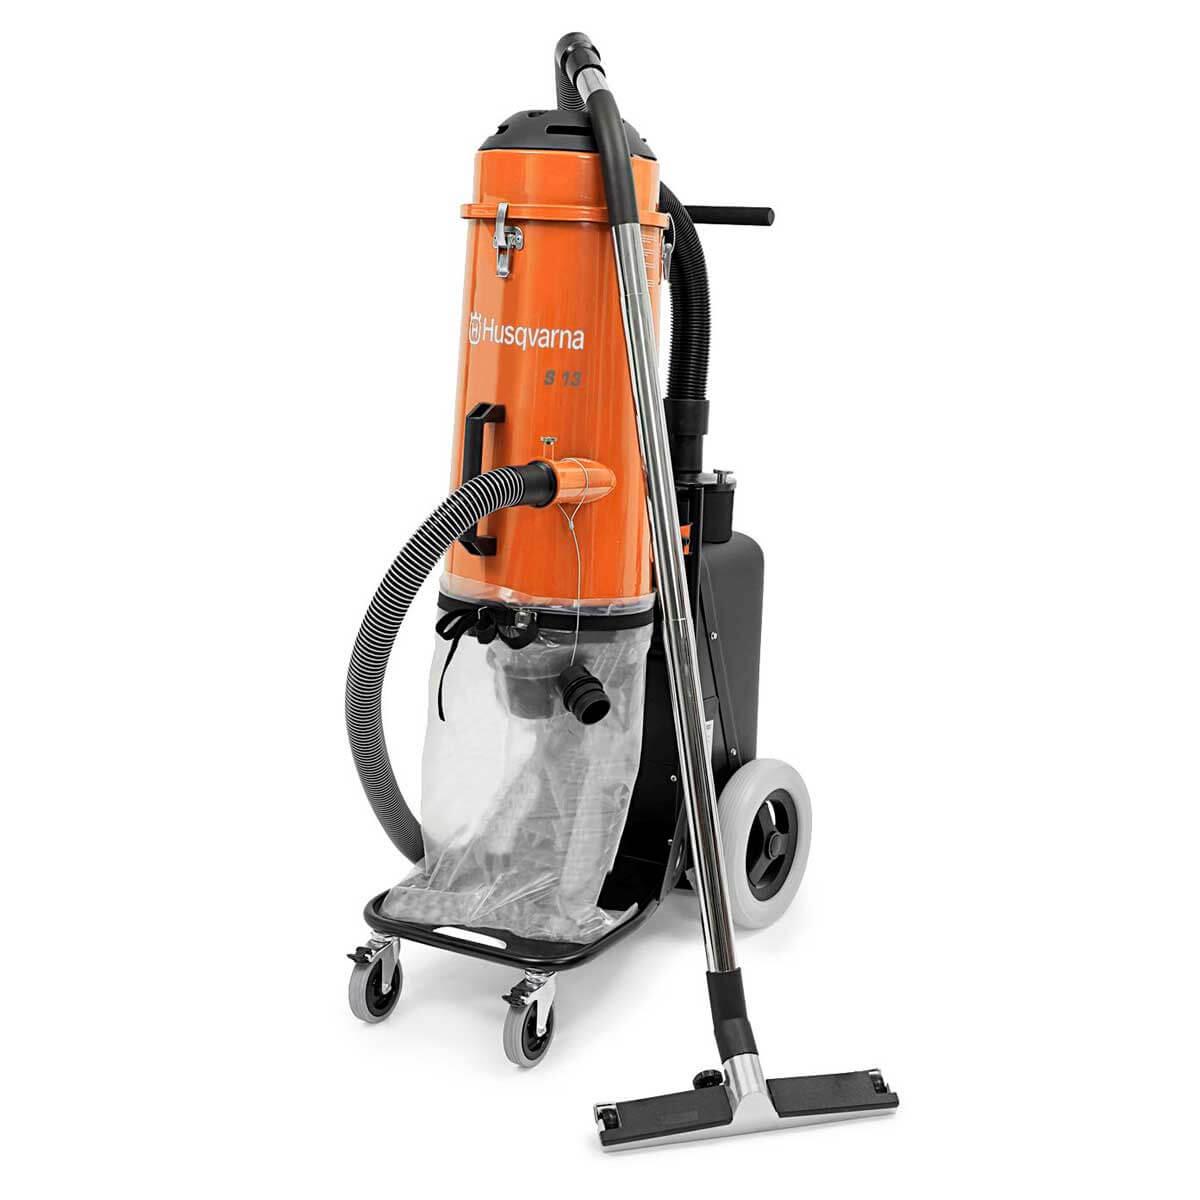 s13 pullman ermator hepa vacuum - Hepa Vacuum